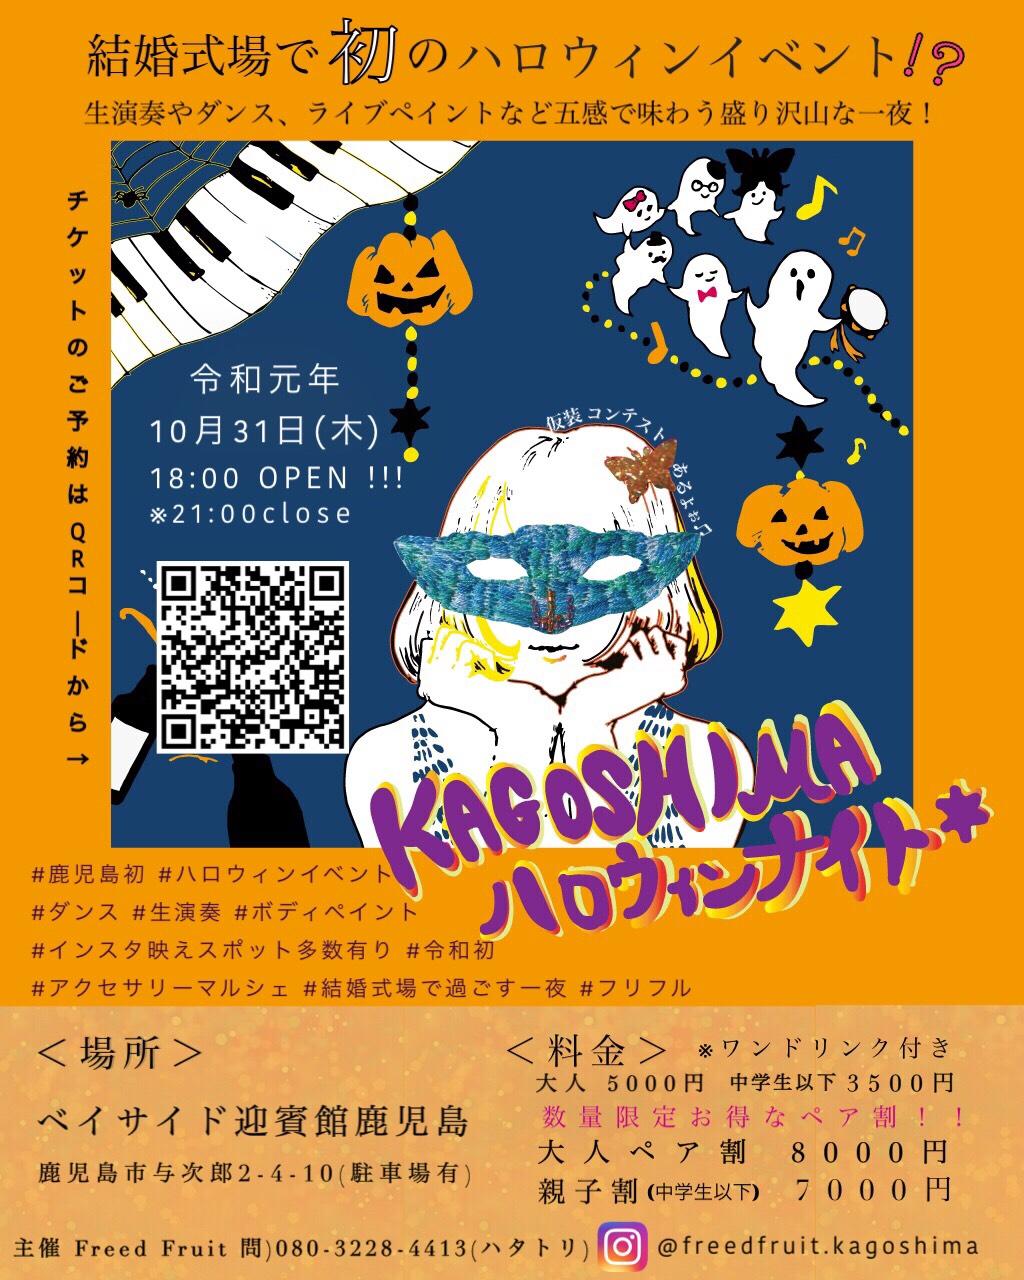 KAGOSHIMA ハロウィンナイト